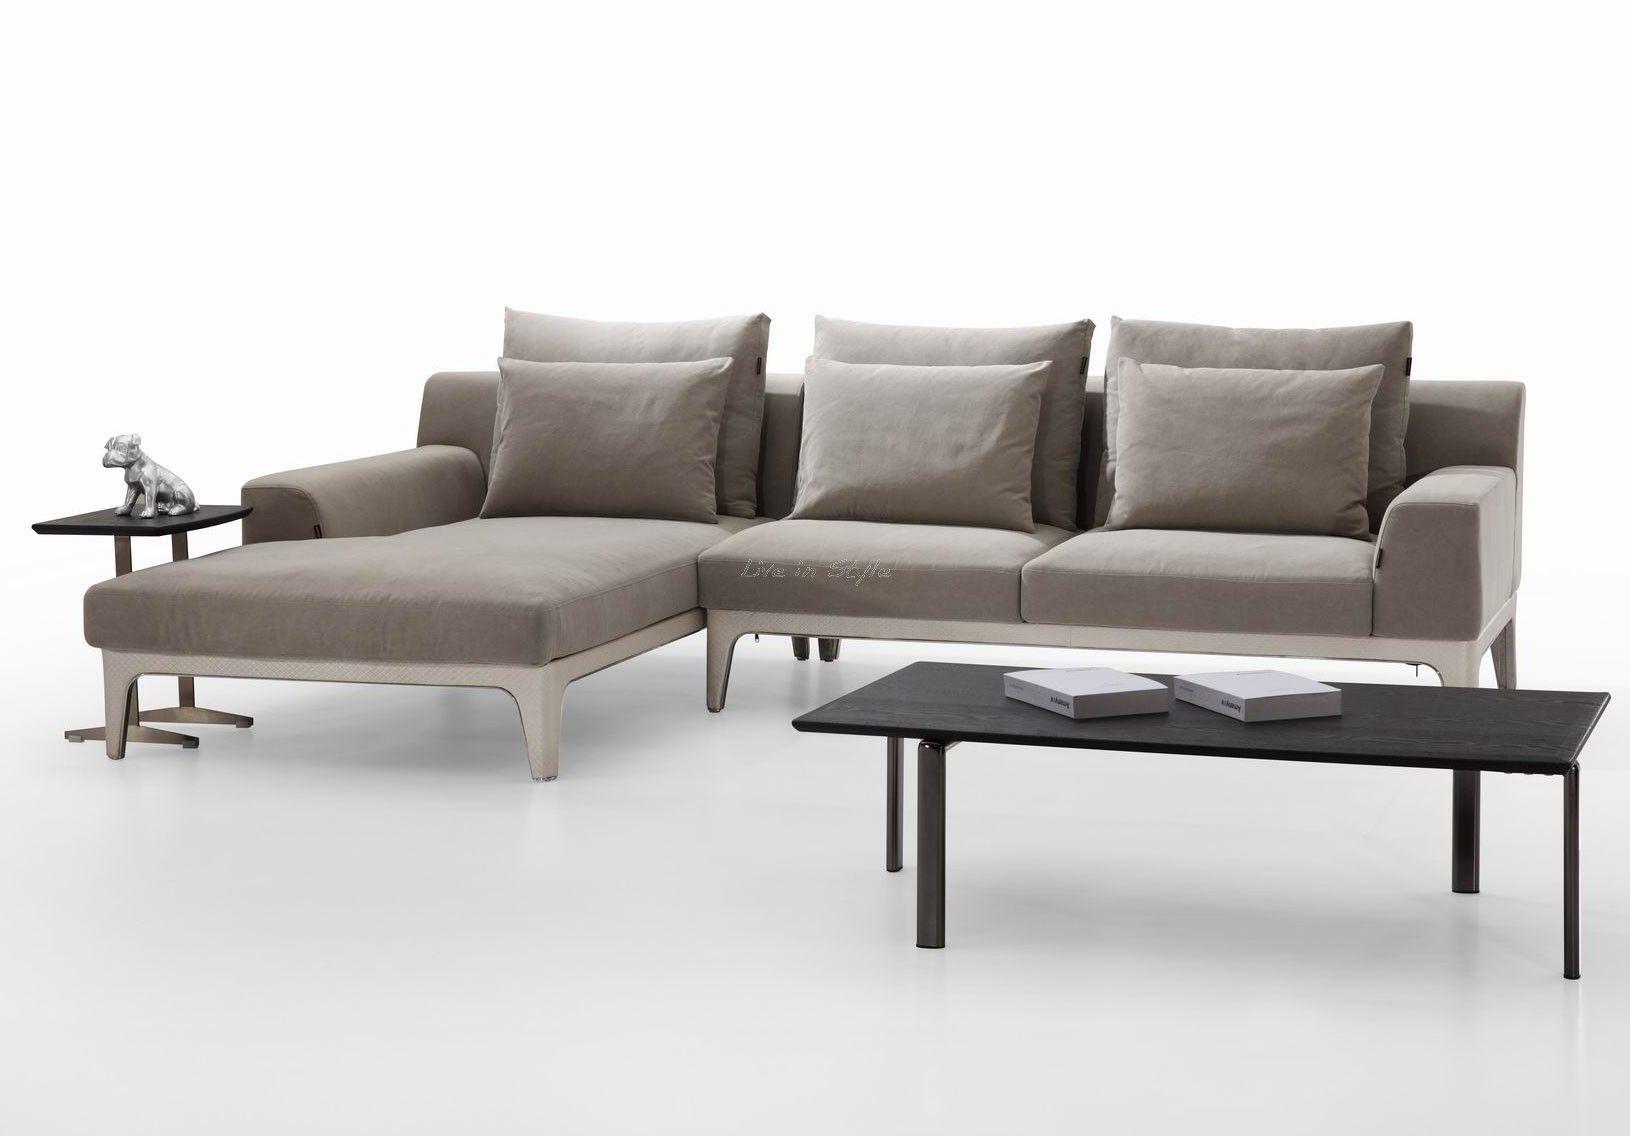 Florence L Shape Italian Sofa Am9835 Modern Sofa Sectional Italian Sofa Home Deco